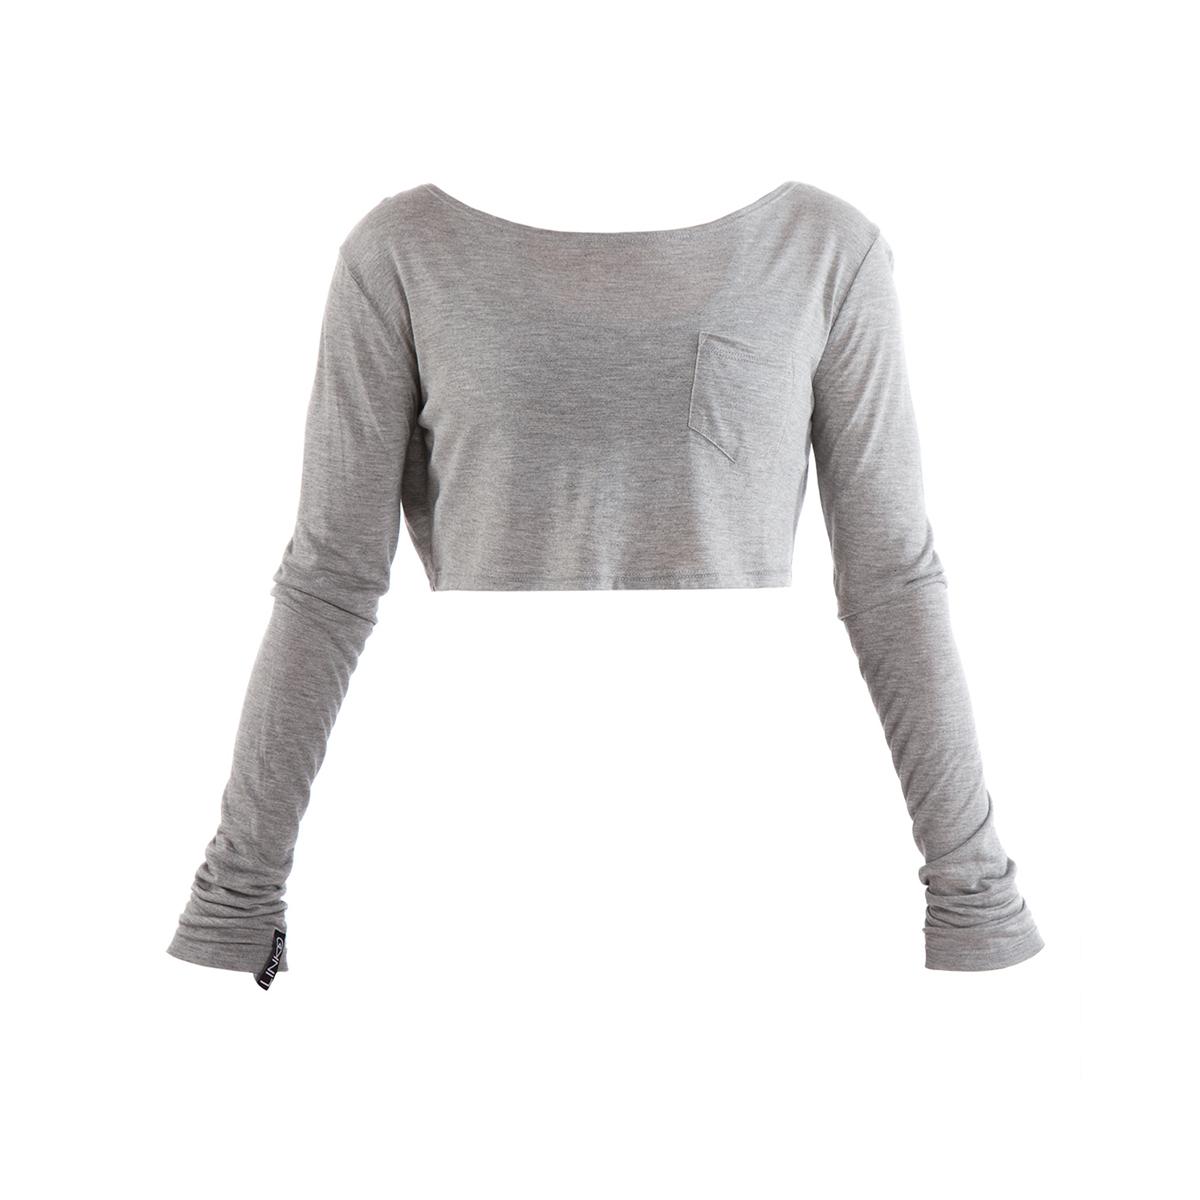 LINKD Long Sleeve Crop - Grey Marle